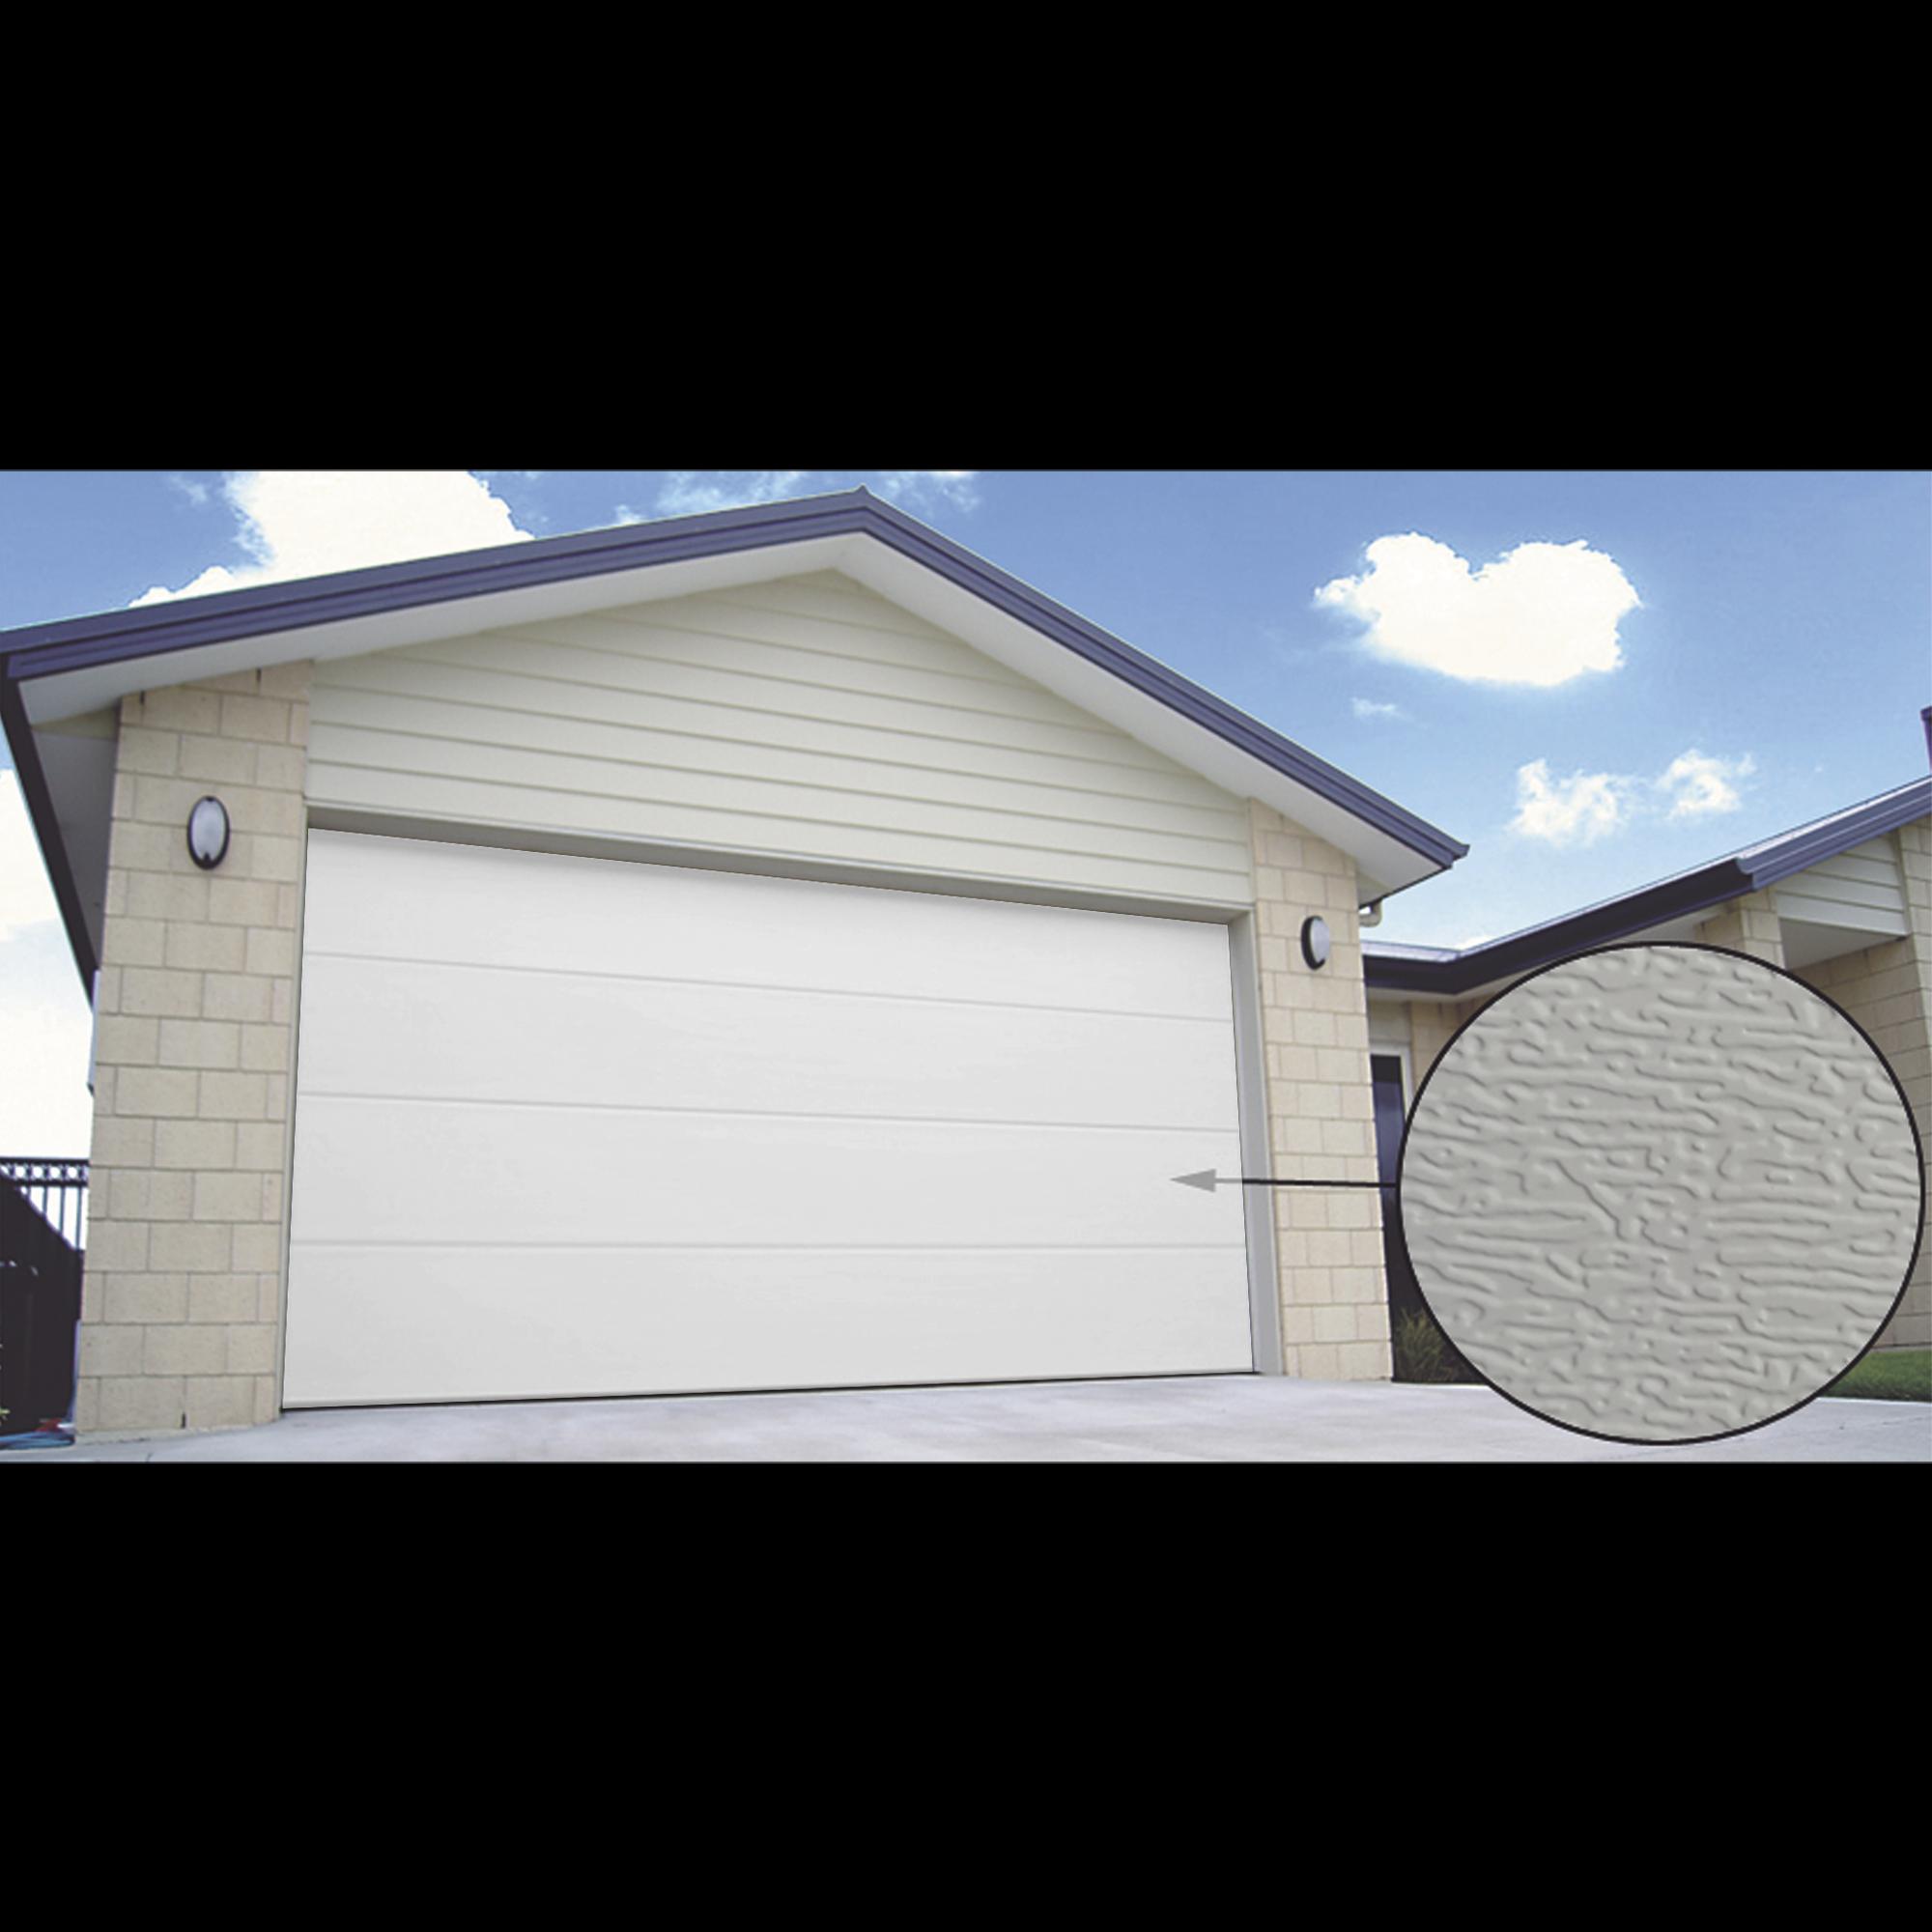 Puerta de Garage PREMIUM, Lisa color blanco  12X8 FT, AISLADA, Estilo U.S.A.